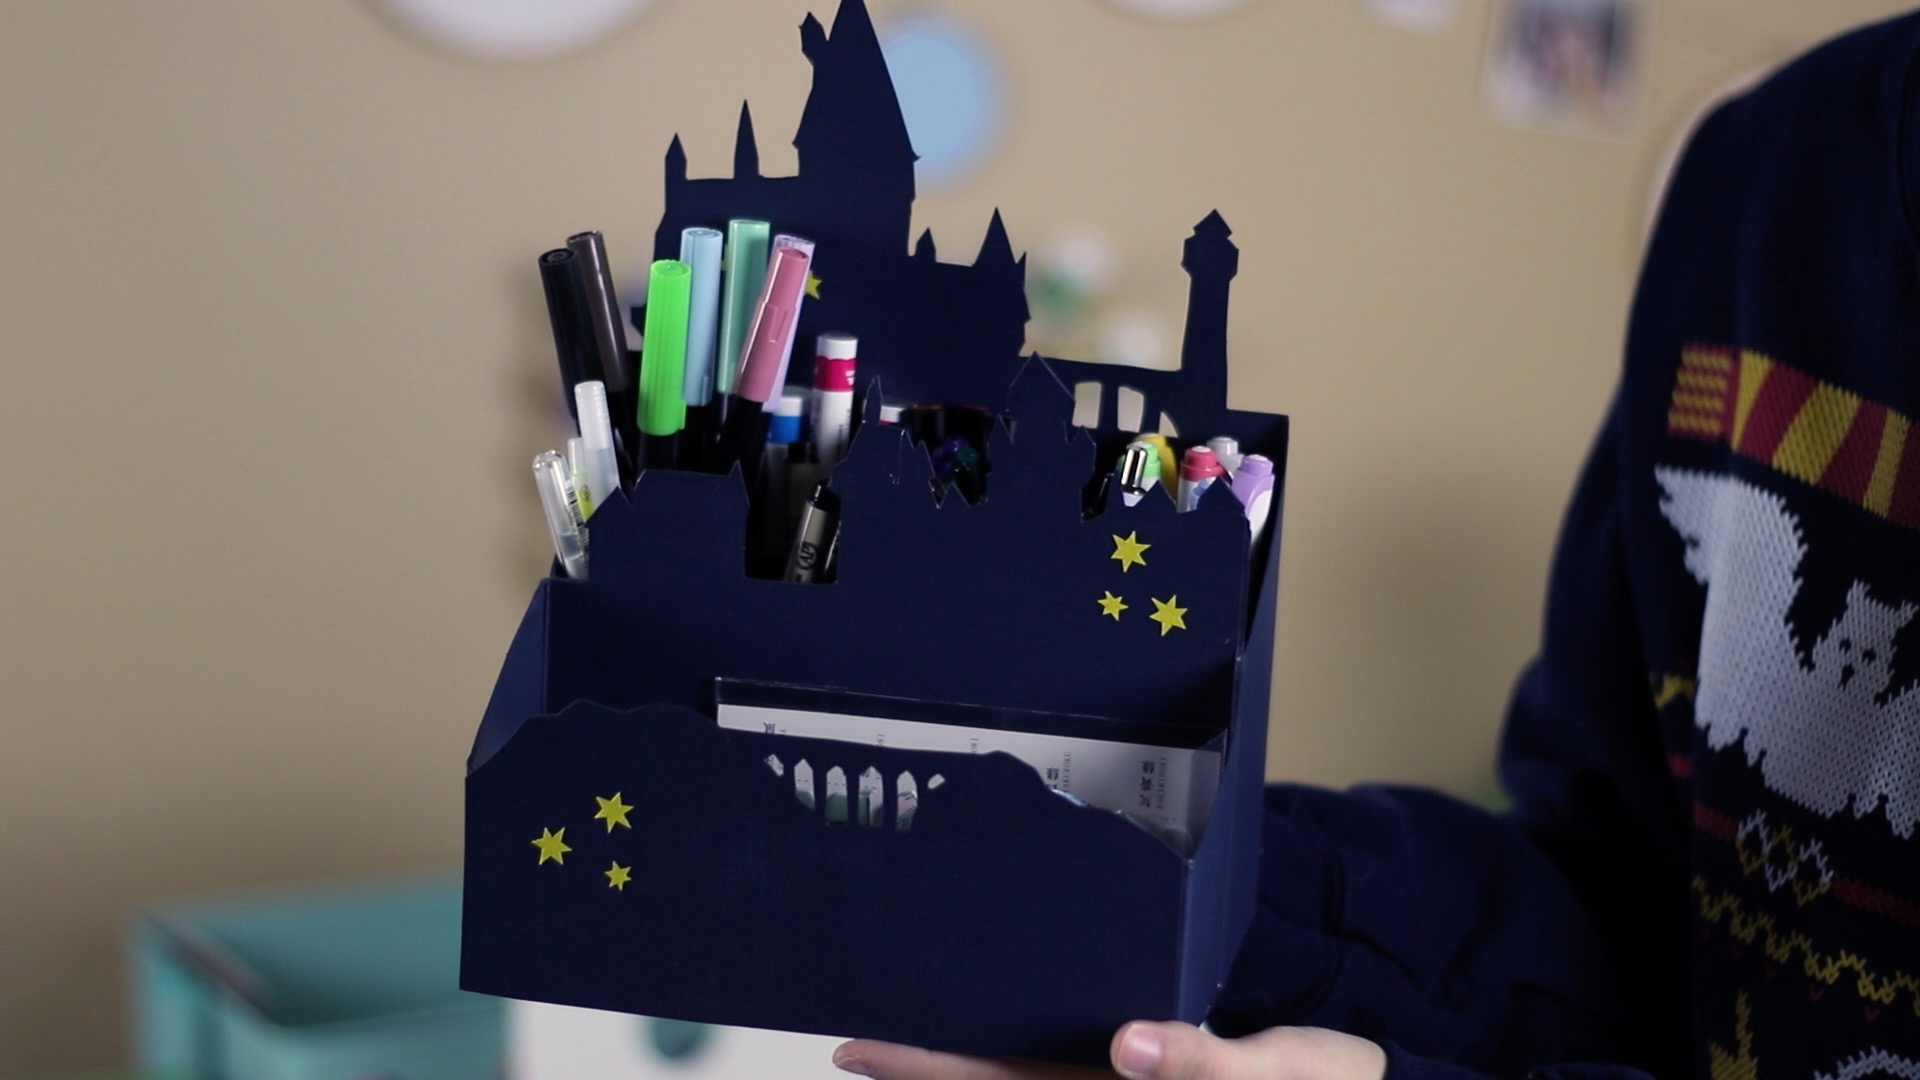 Upcycled Hogwarts Desk Organizer